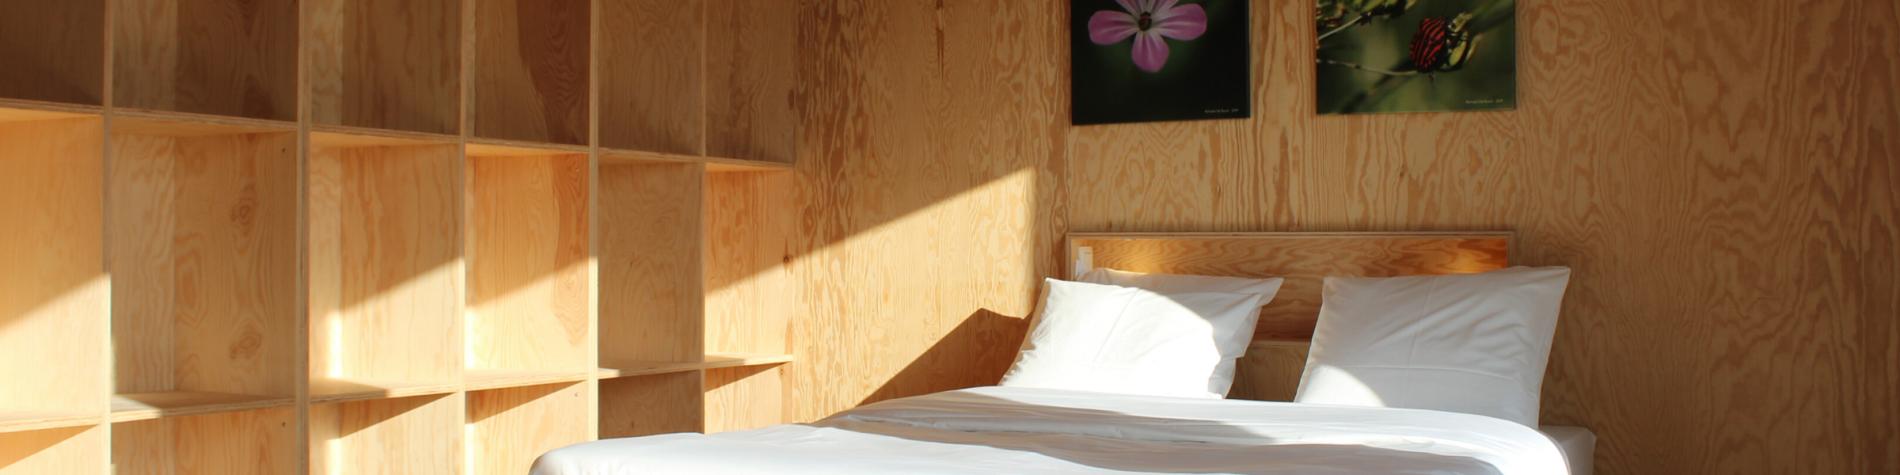 Domaine de Massembre - Chambre Confort Plus